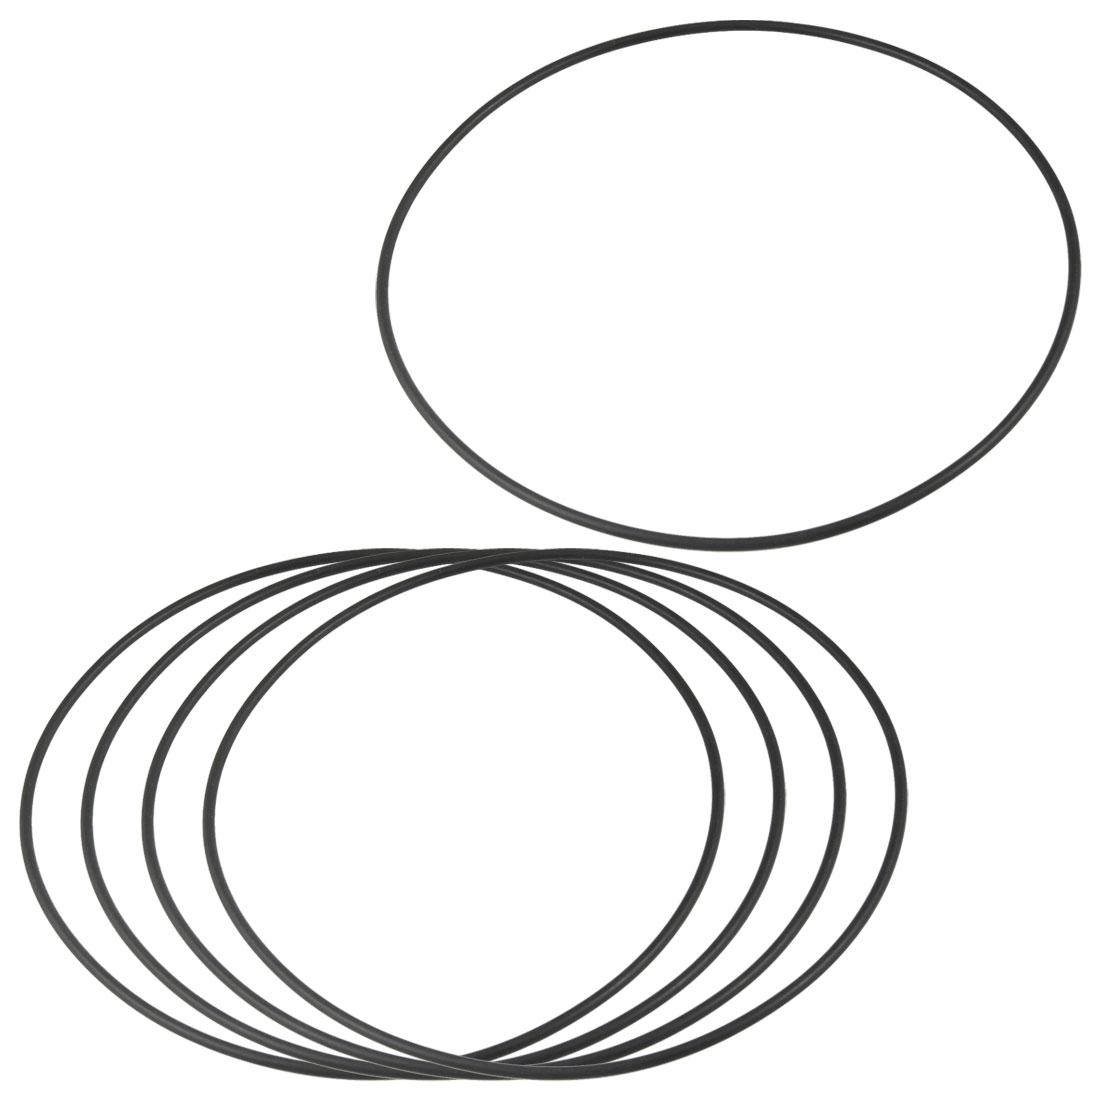 5 Pcs 165mm x 3.1mm Flexible Rubber O Rings Sealing Washer Black